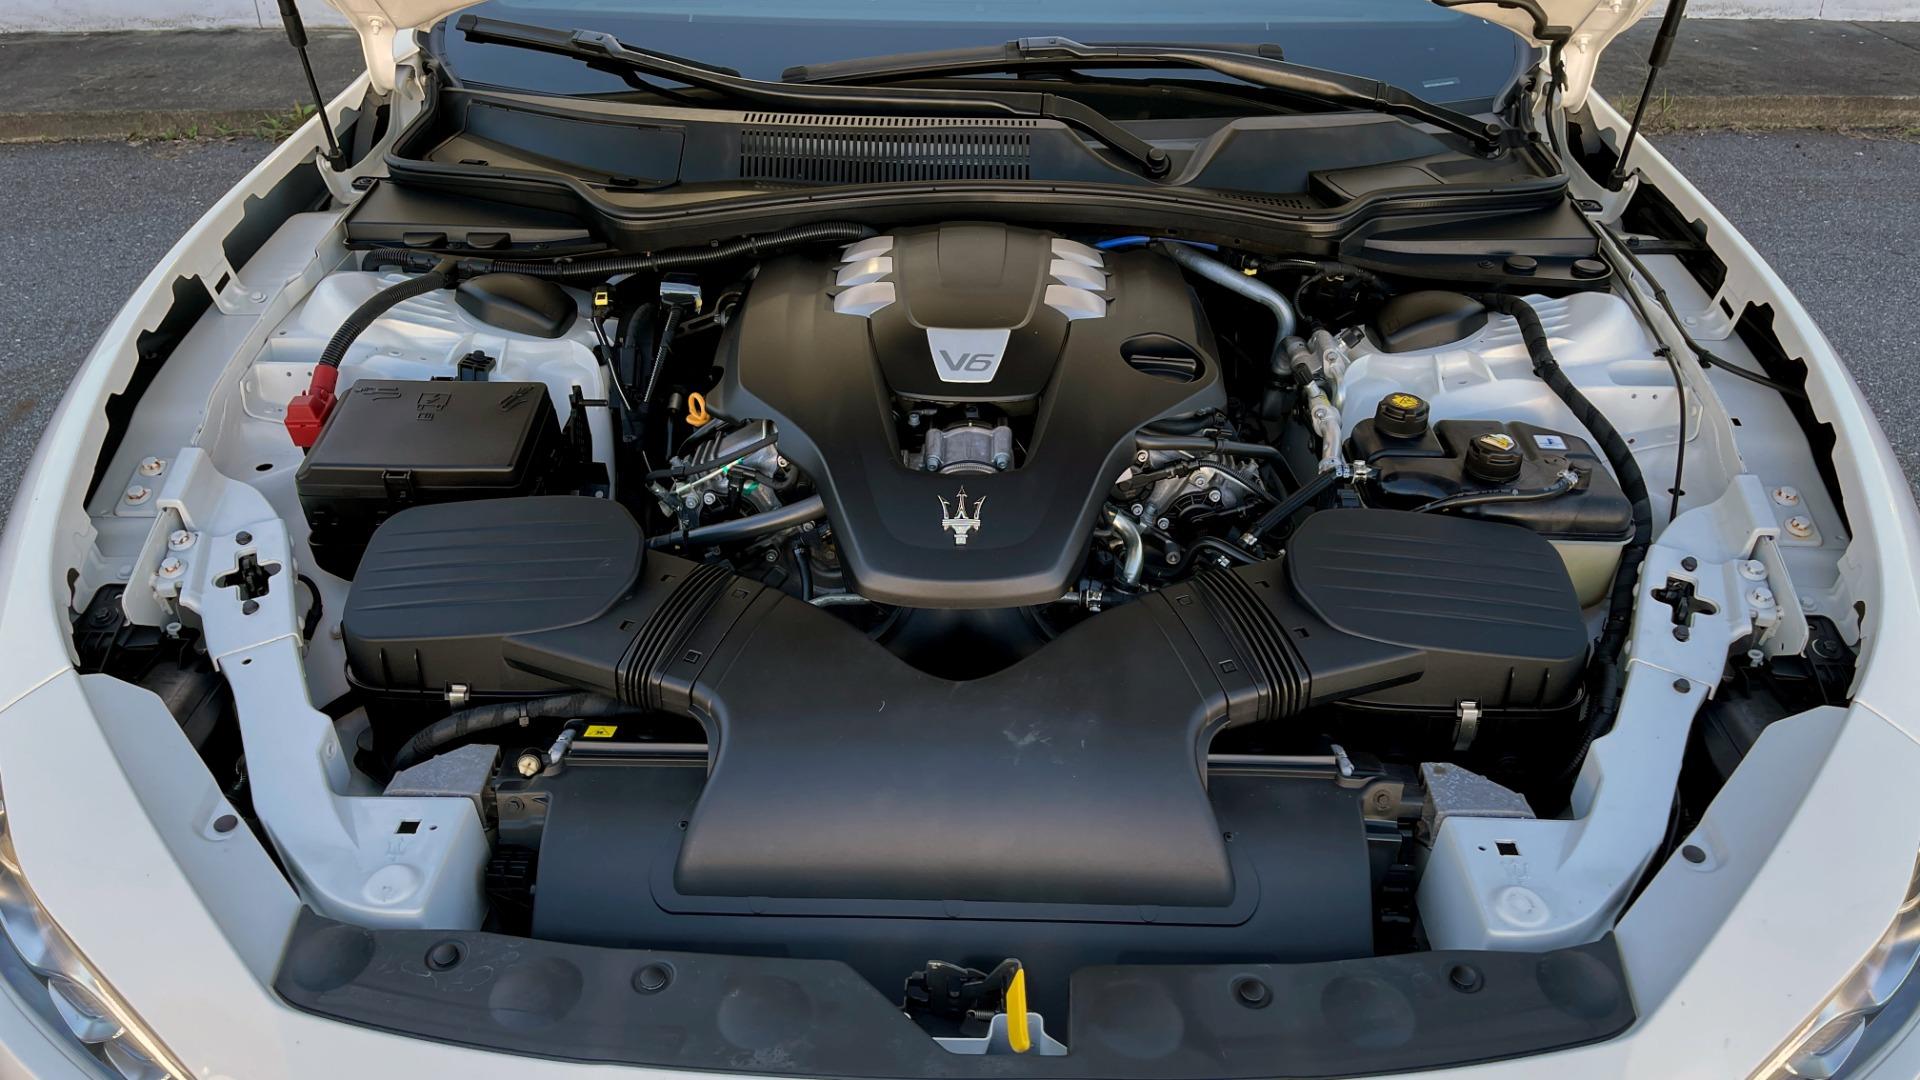 Used 2018 Maserati GHIBLI SEDAN / RWD / 3.0L V6 / SUNROOF / NAV / REARVIEW for sale $42,995 at Formula Imports in Charlotte NC 28227 12